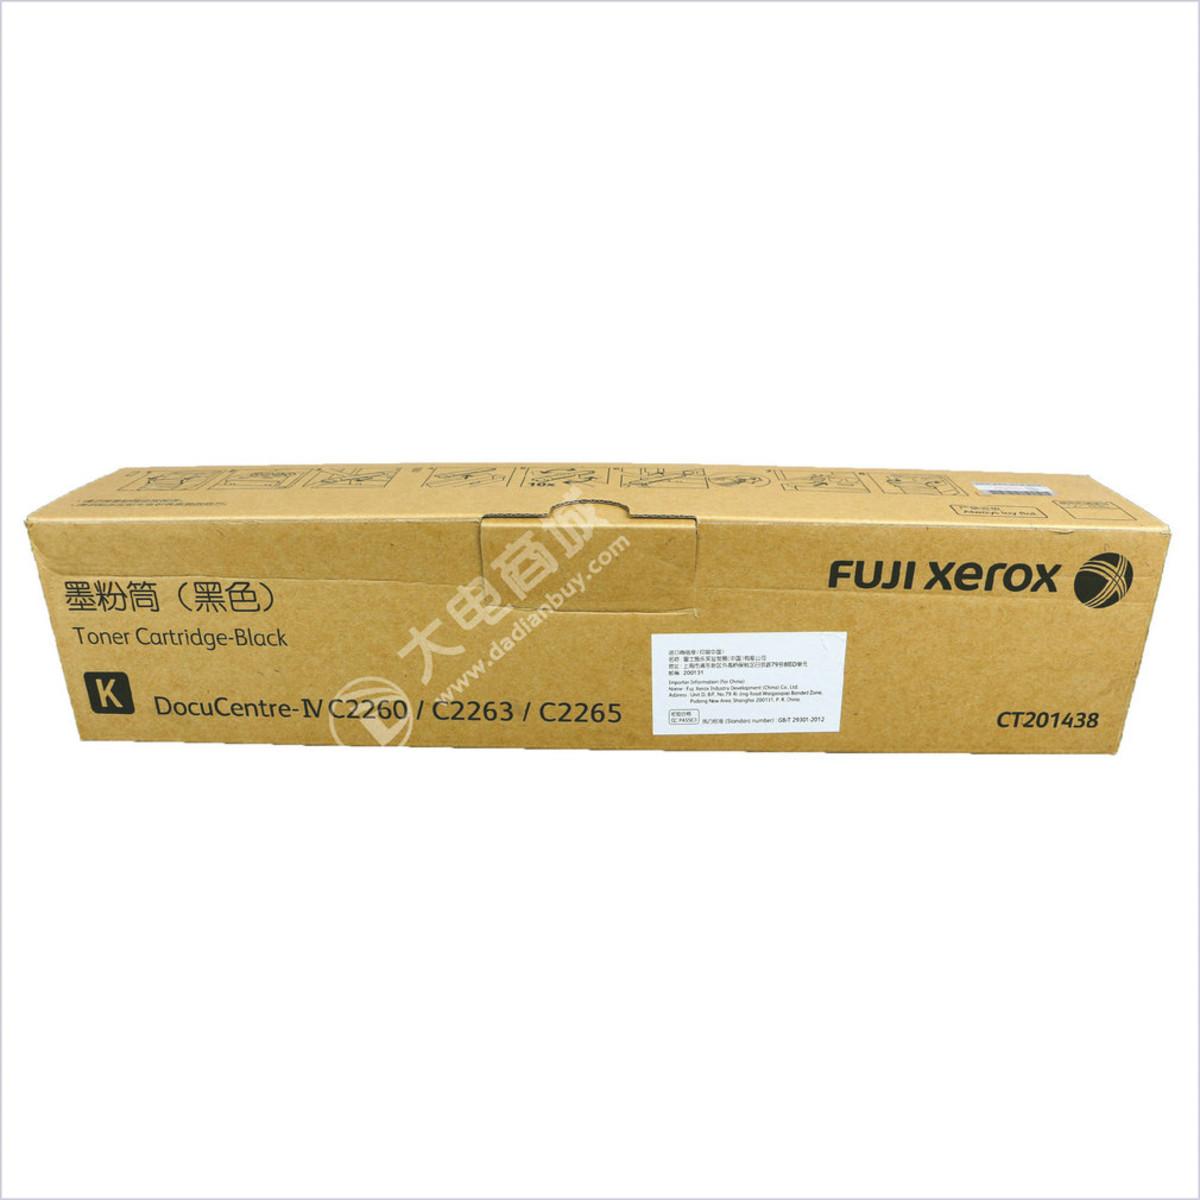 Xerox CT201434 Black Toner Cartridge